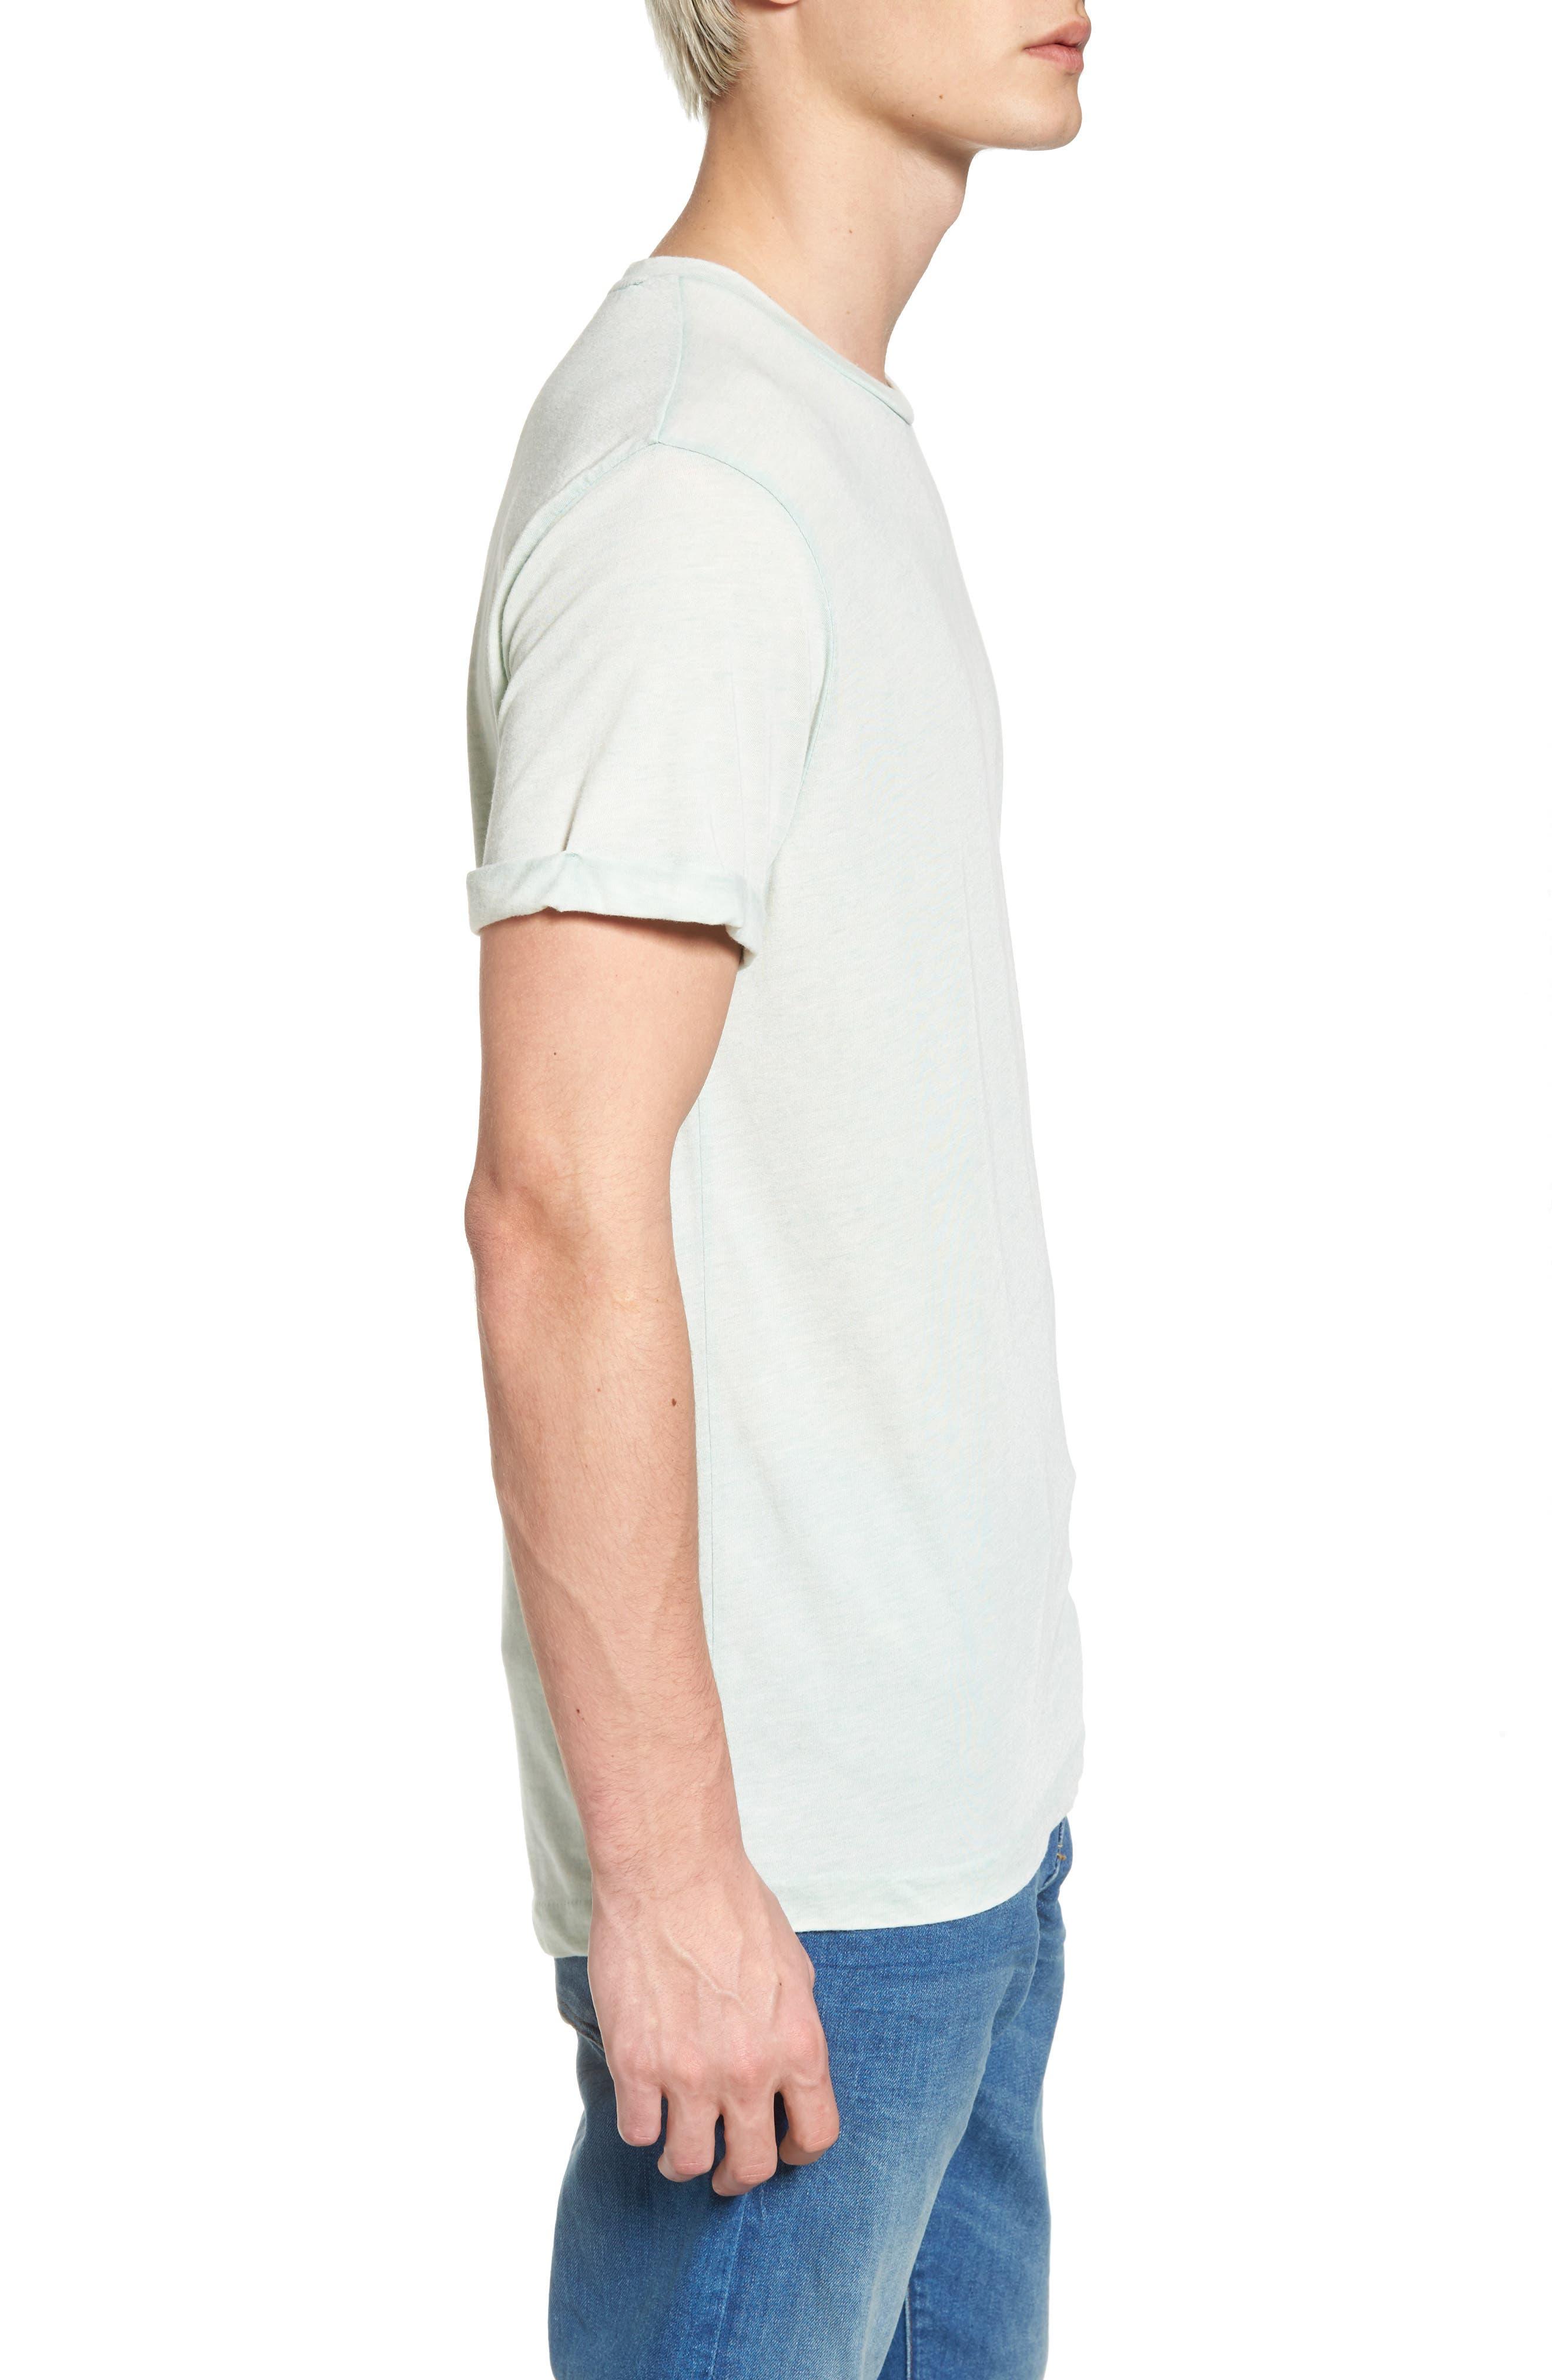 Ausbrenner T-Shirt,                             Alternate thumbnail 3, color,                             Seafoam Green Melange